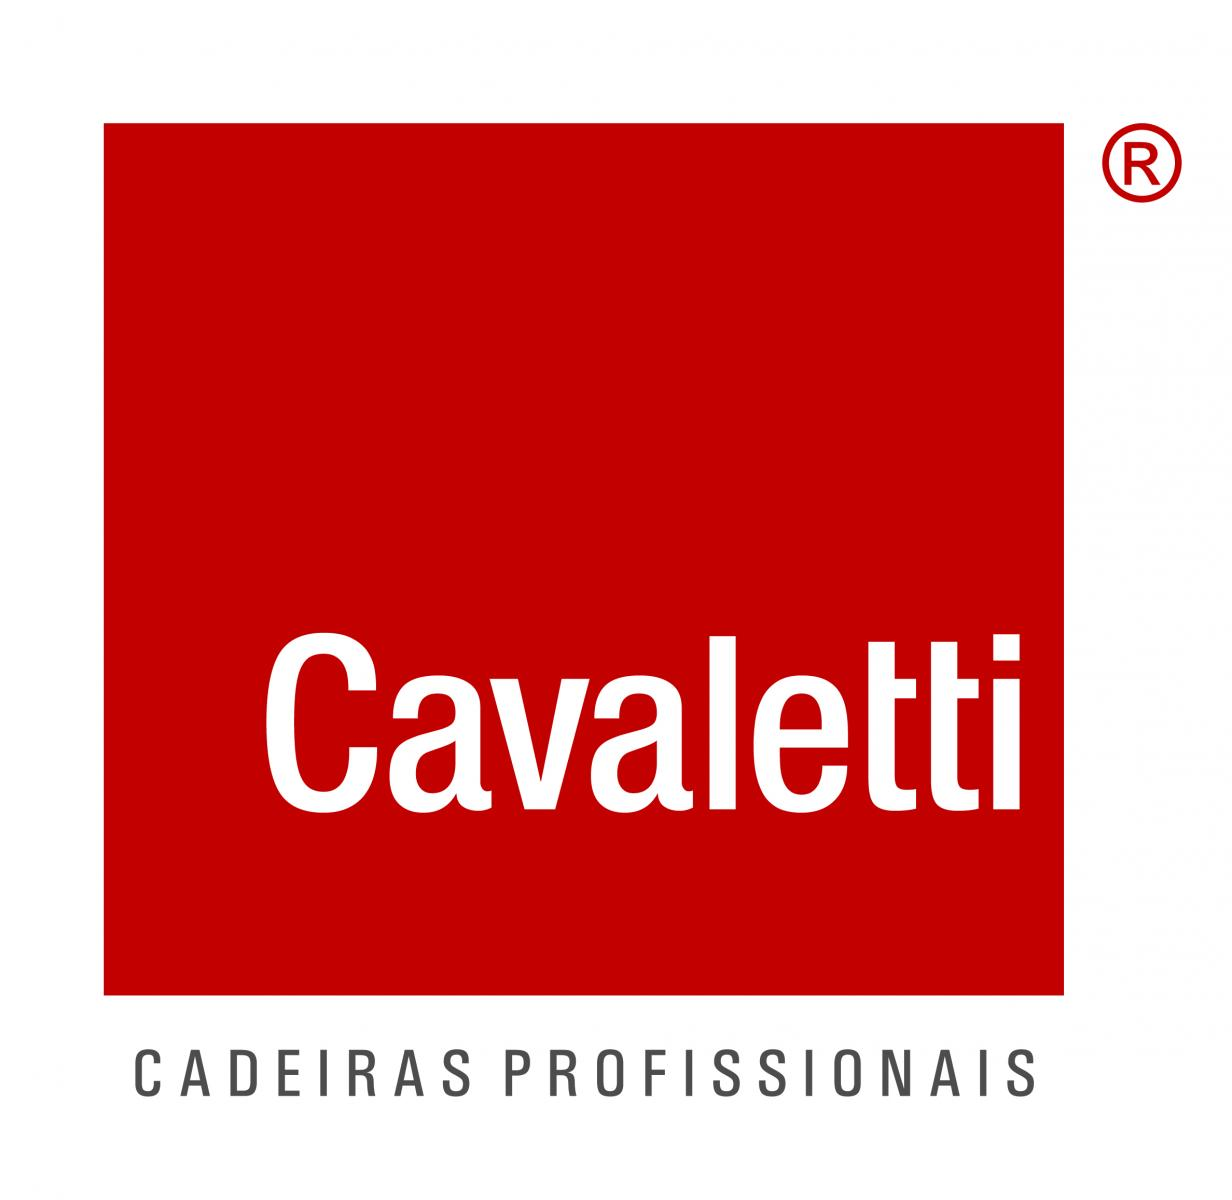 Cavaletti.jpg